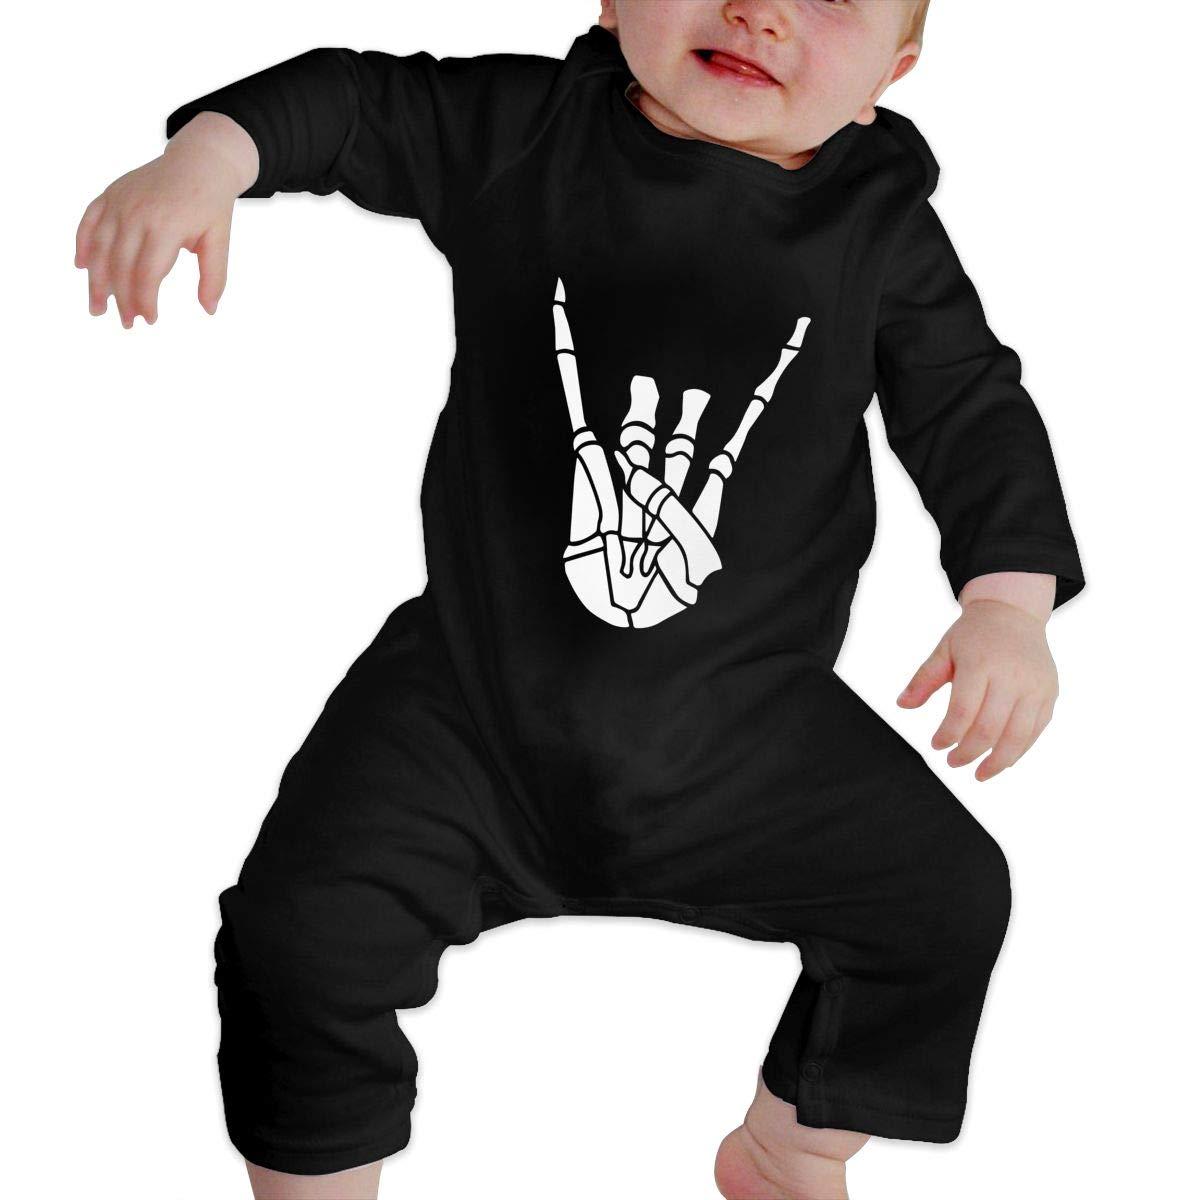 Newborn Baby Girls Boys Long Sleeve Jumpsuit Warm Skeleton Rock Cotton Jumpsuit